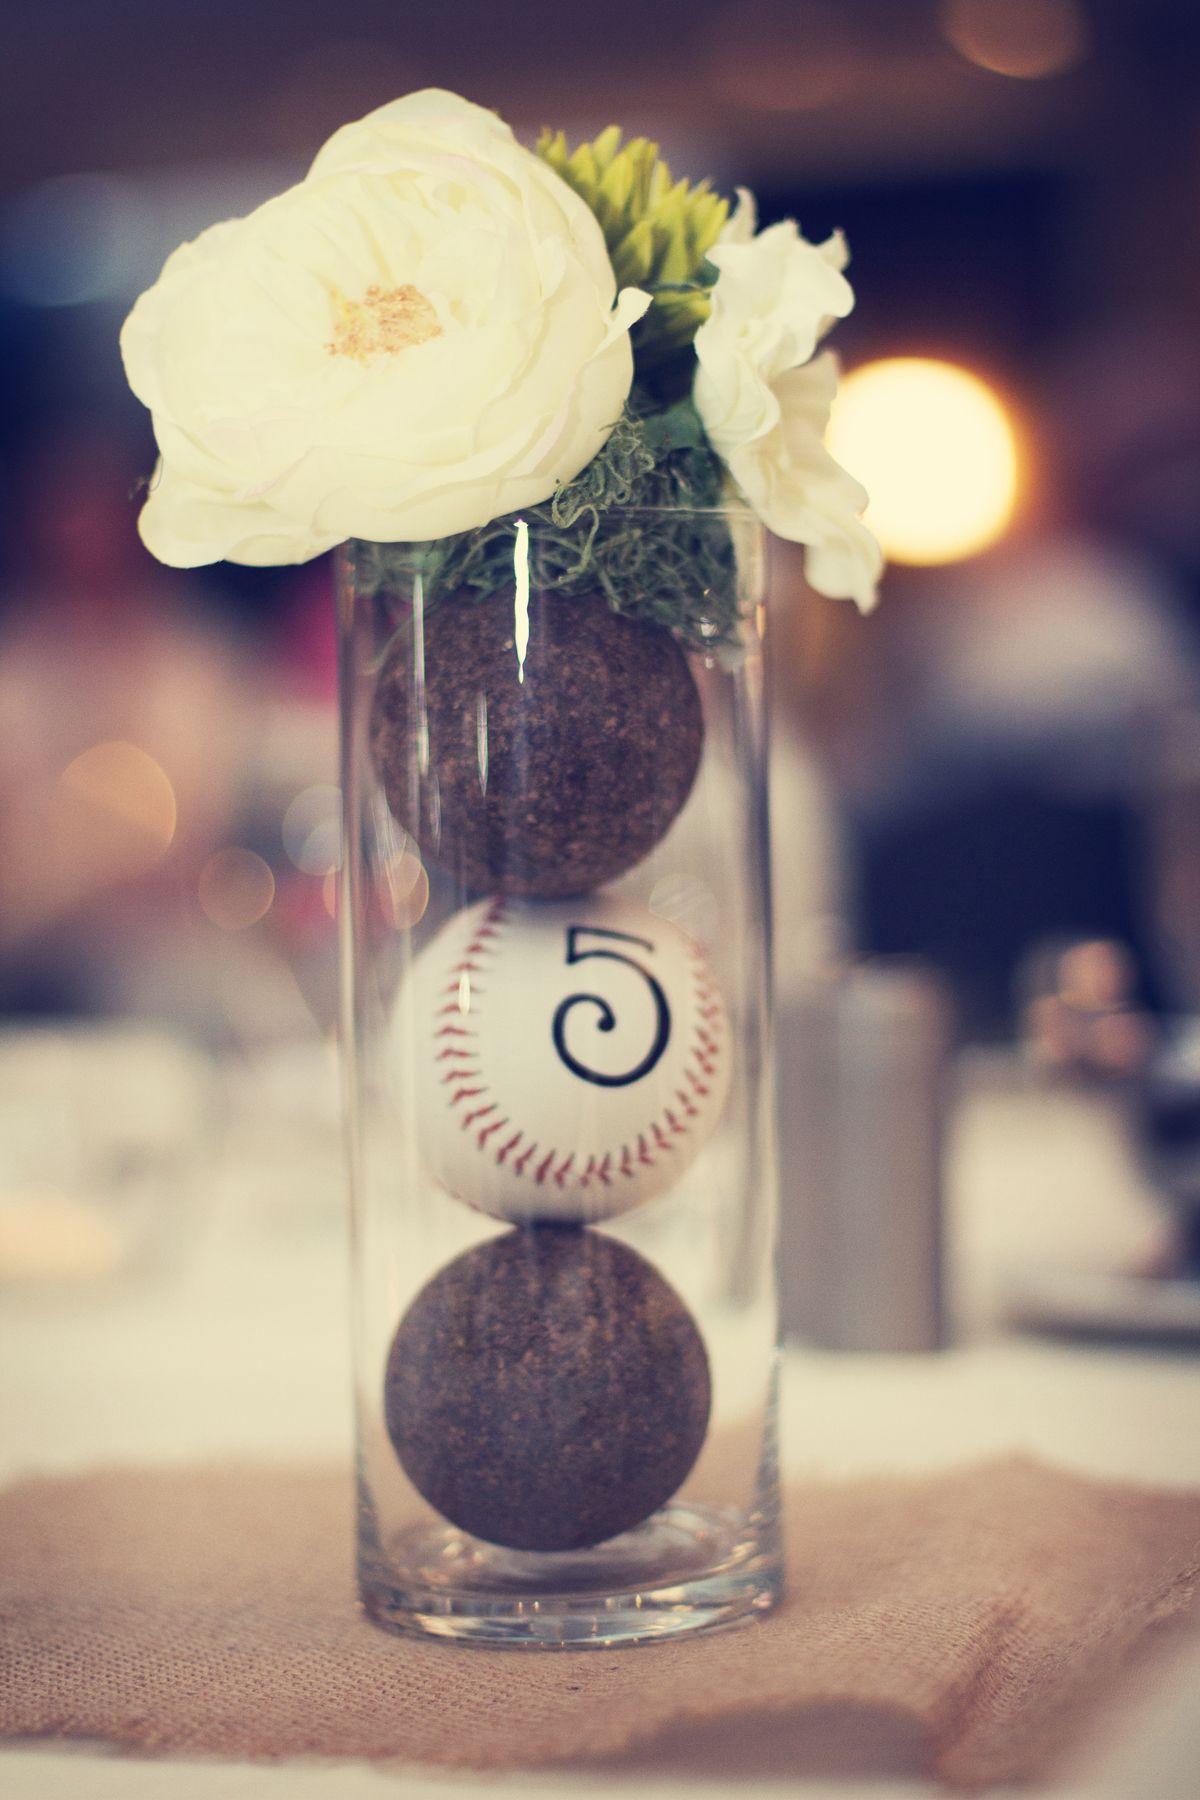 Adorable Baseball Themed Centerpieces Photo By Angela #Minneapolisweddingphotographers #Targetfield #Baseballwedding